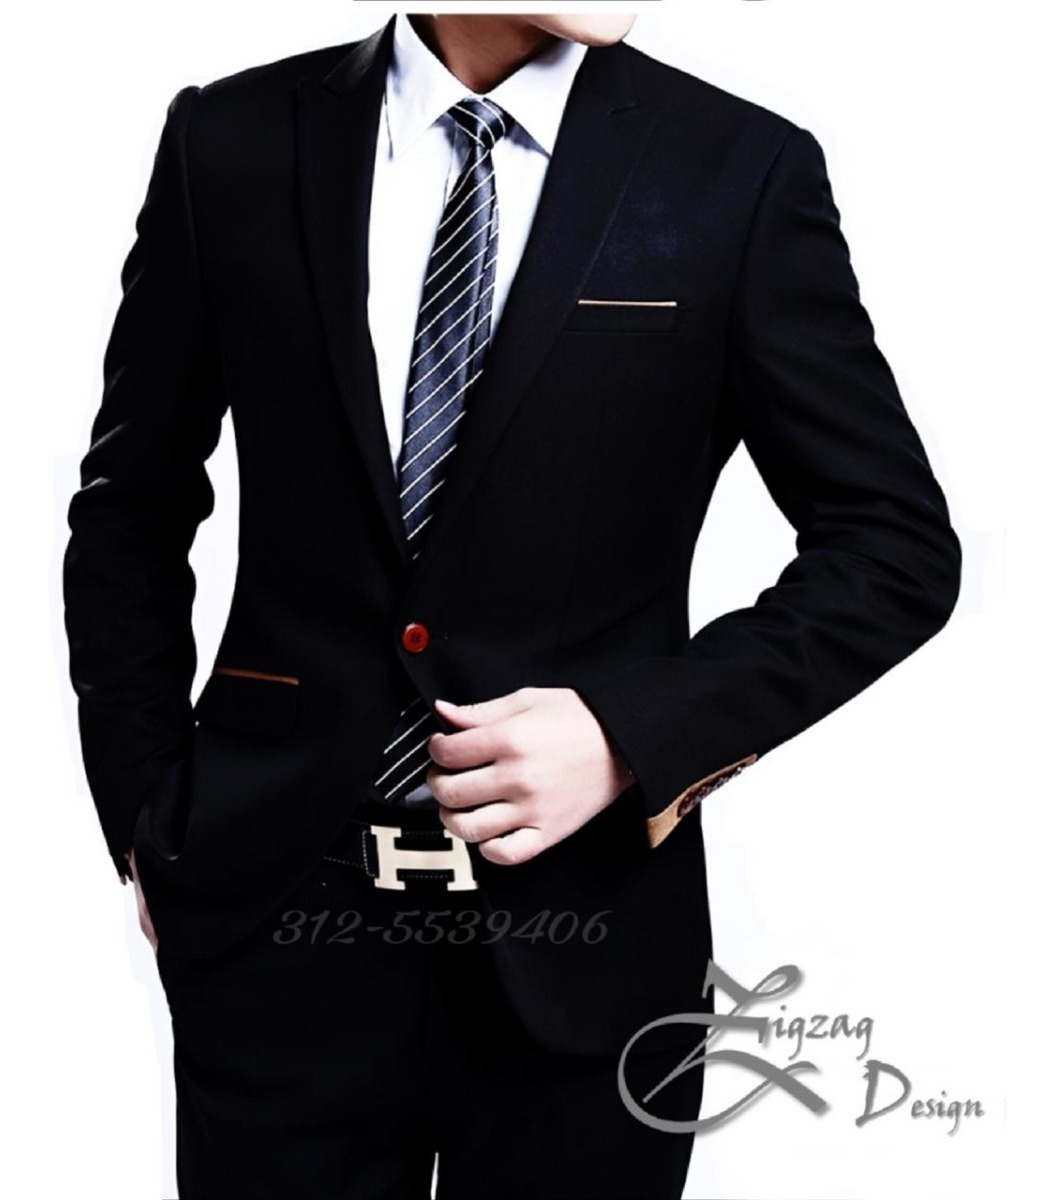 Traje Economica Formal Fit Paño Linea Slim Elegantre Vestido WEDIH92